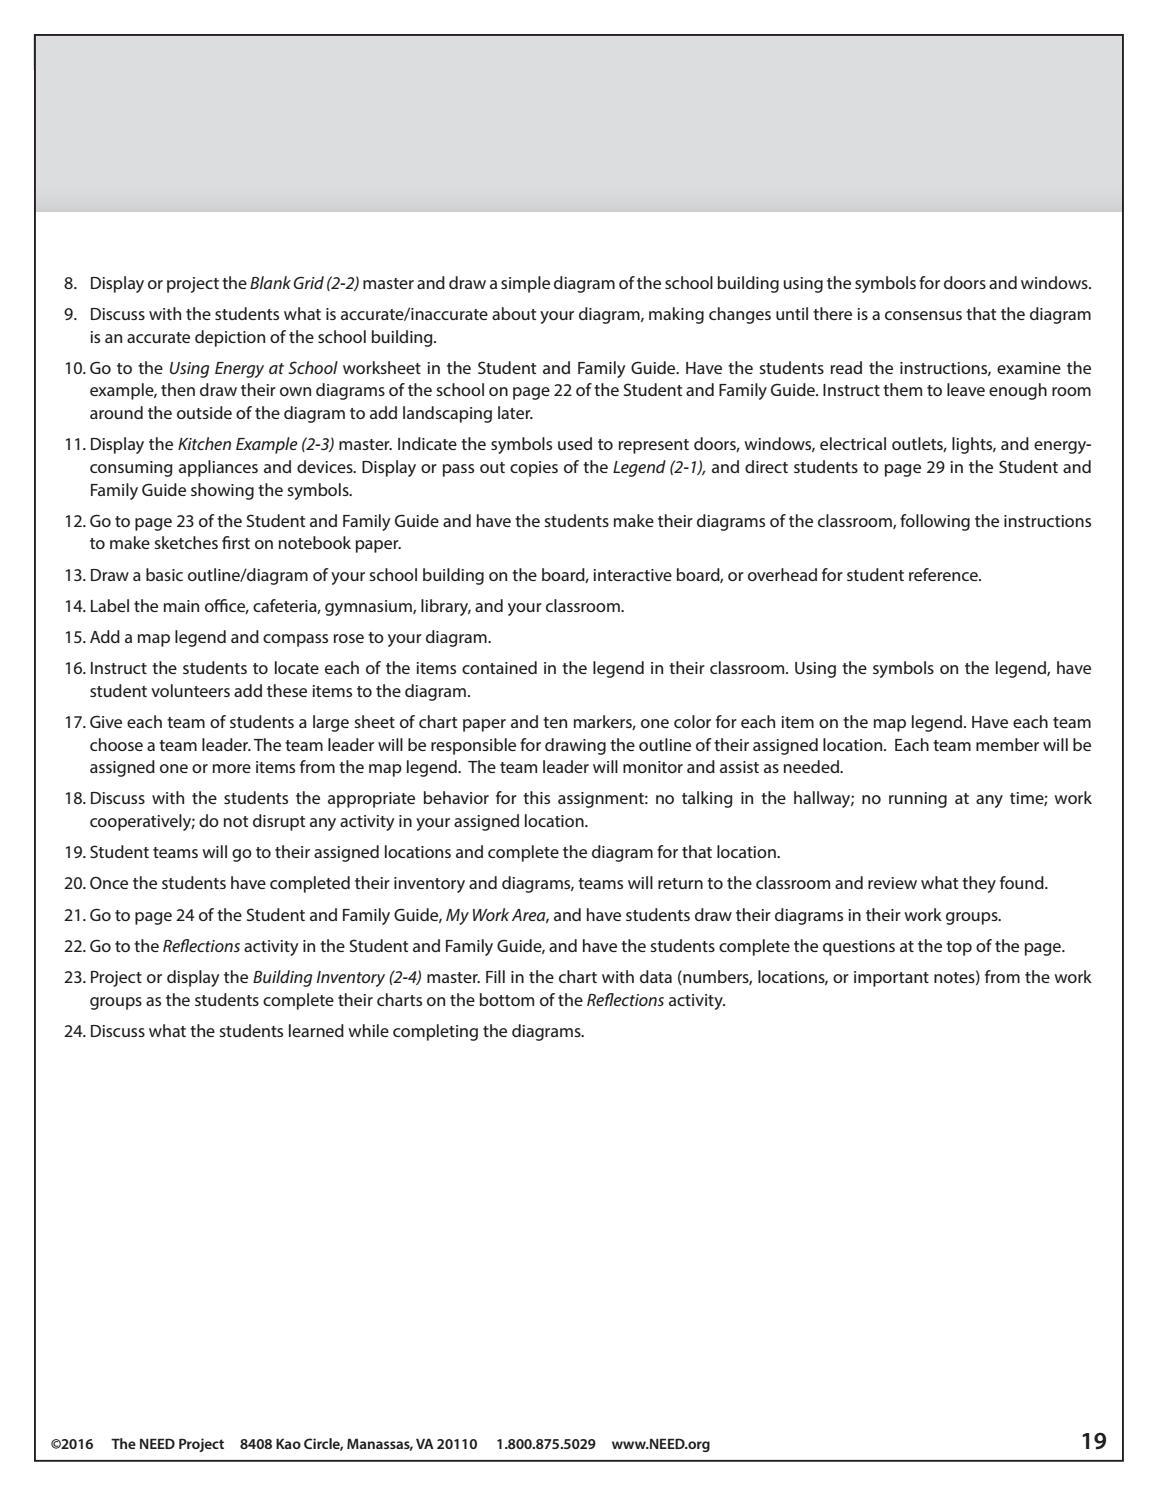 Saving energy teacher guide by need project issuu buycottarizona Choice Image